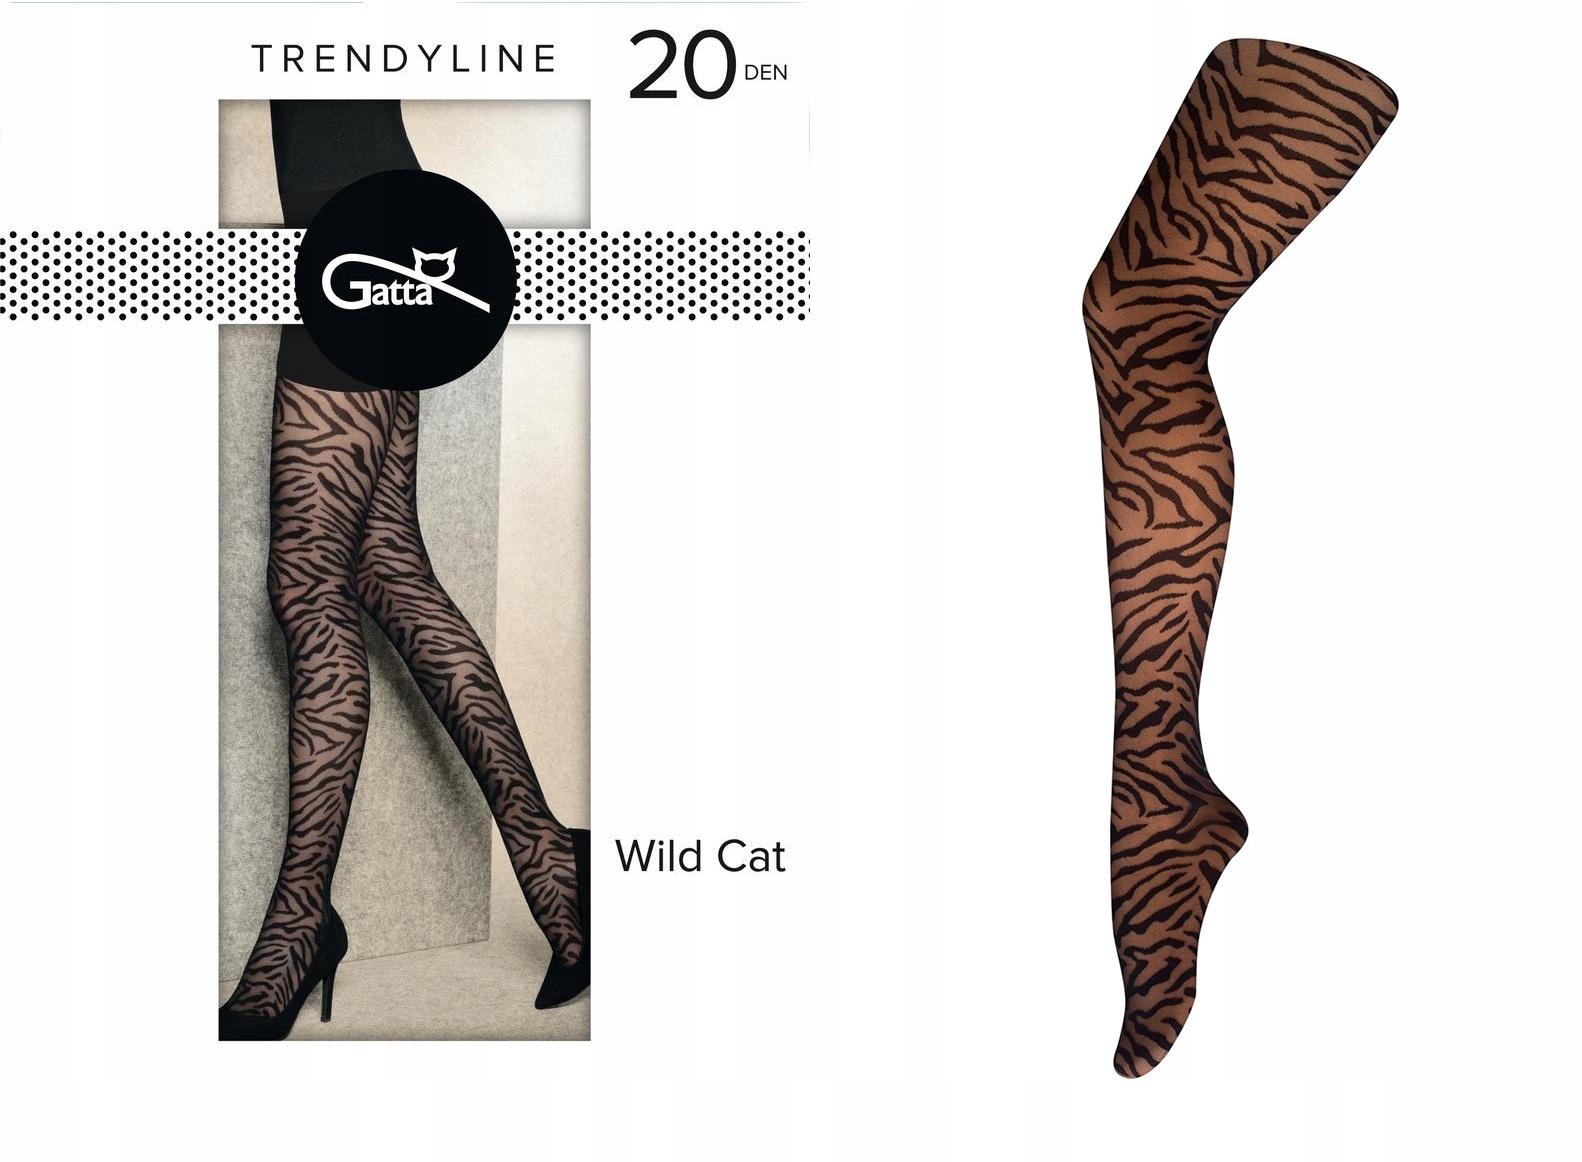 Gatta Rajstopy Wild Cat 03 ROZ.2-S Nero Zebra